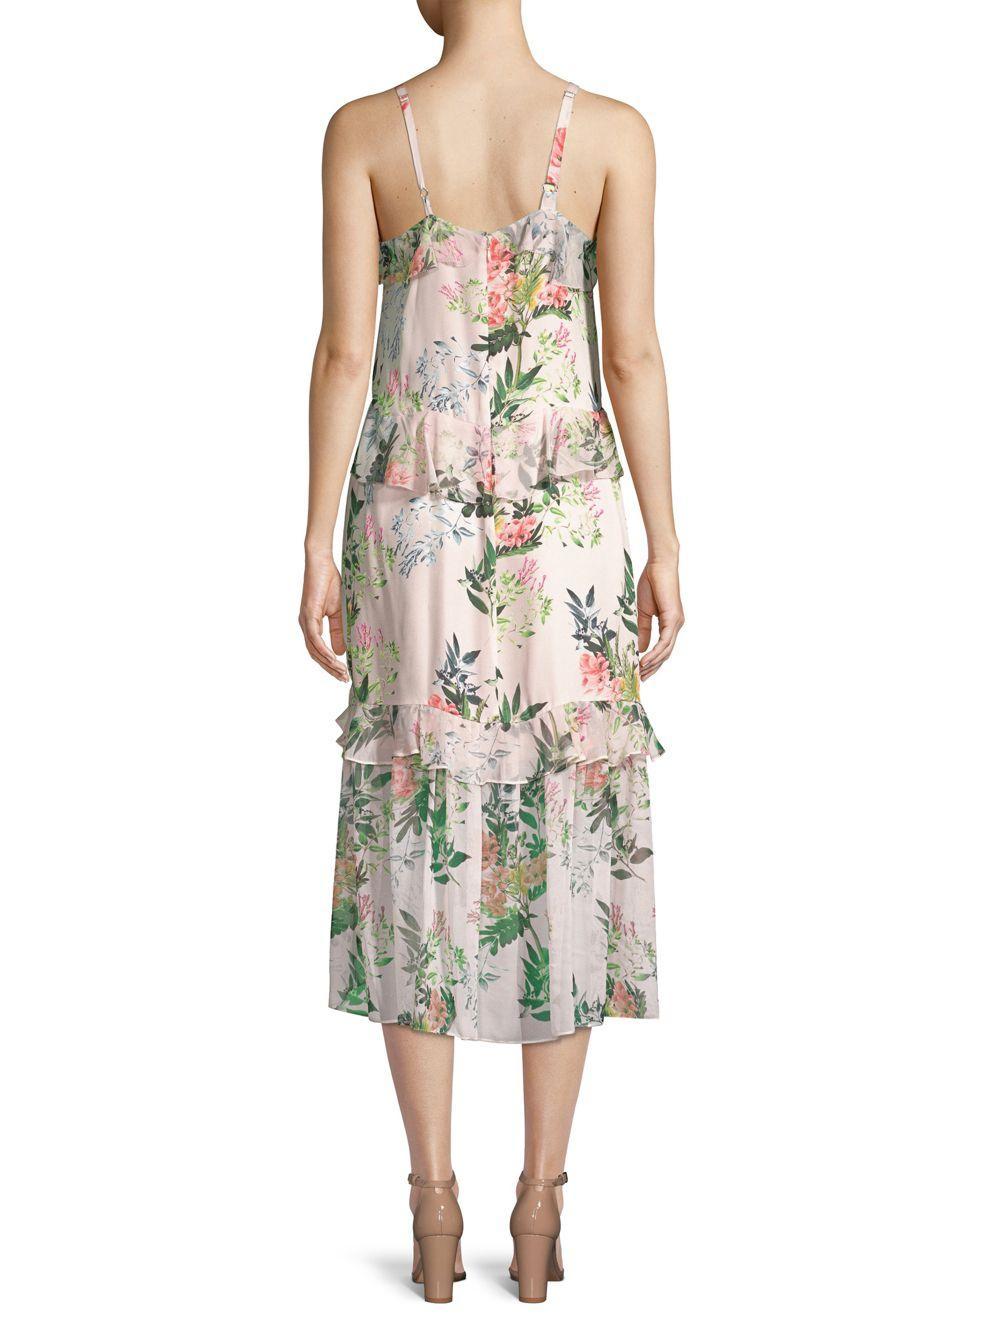 77cc99a8948f4a Parker Josie Floral Silk Midi Dress - Save 6% - Lyst